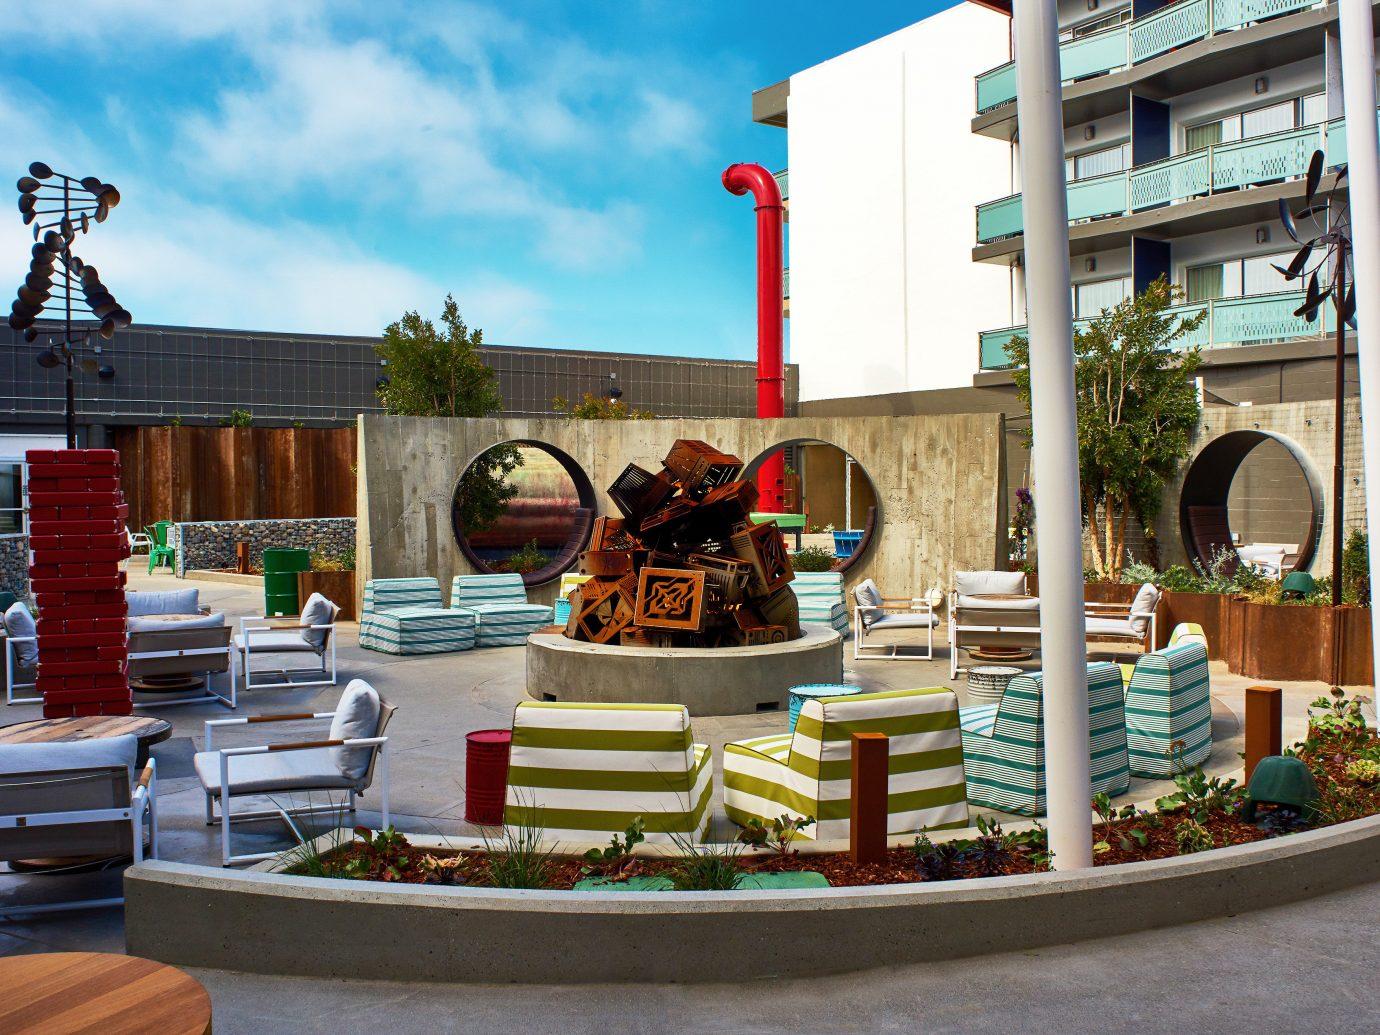 Hotels outdoor vacation home Resort